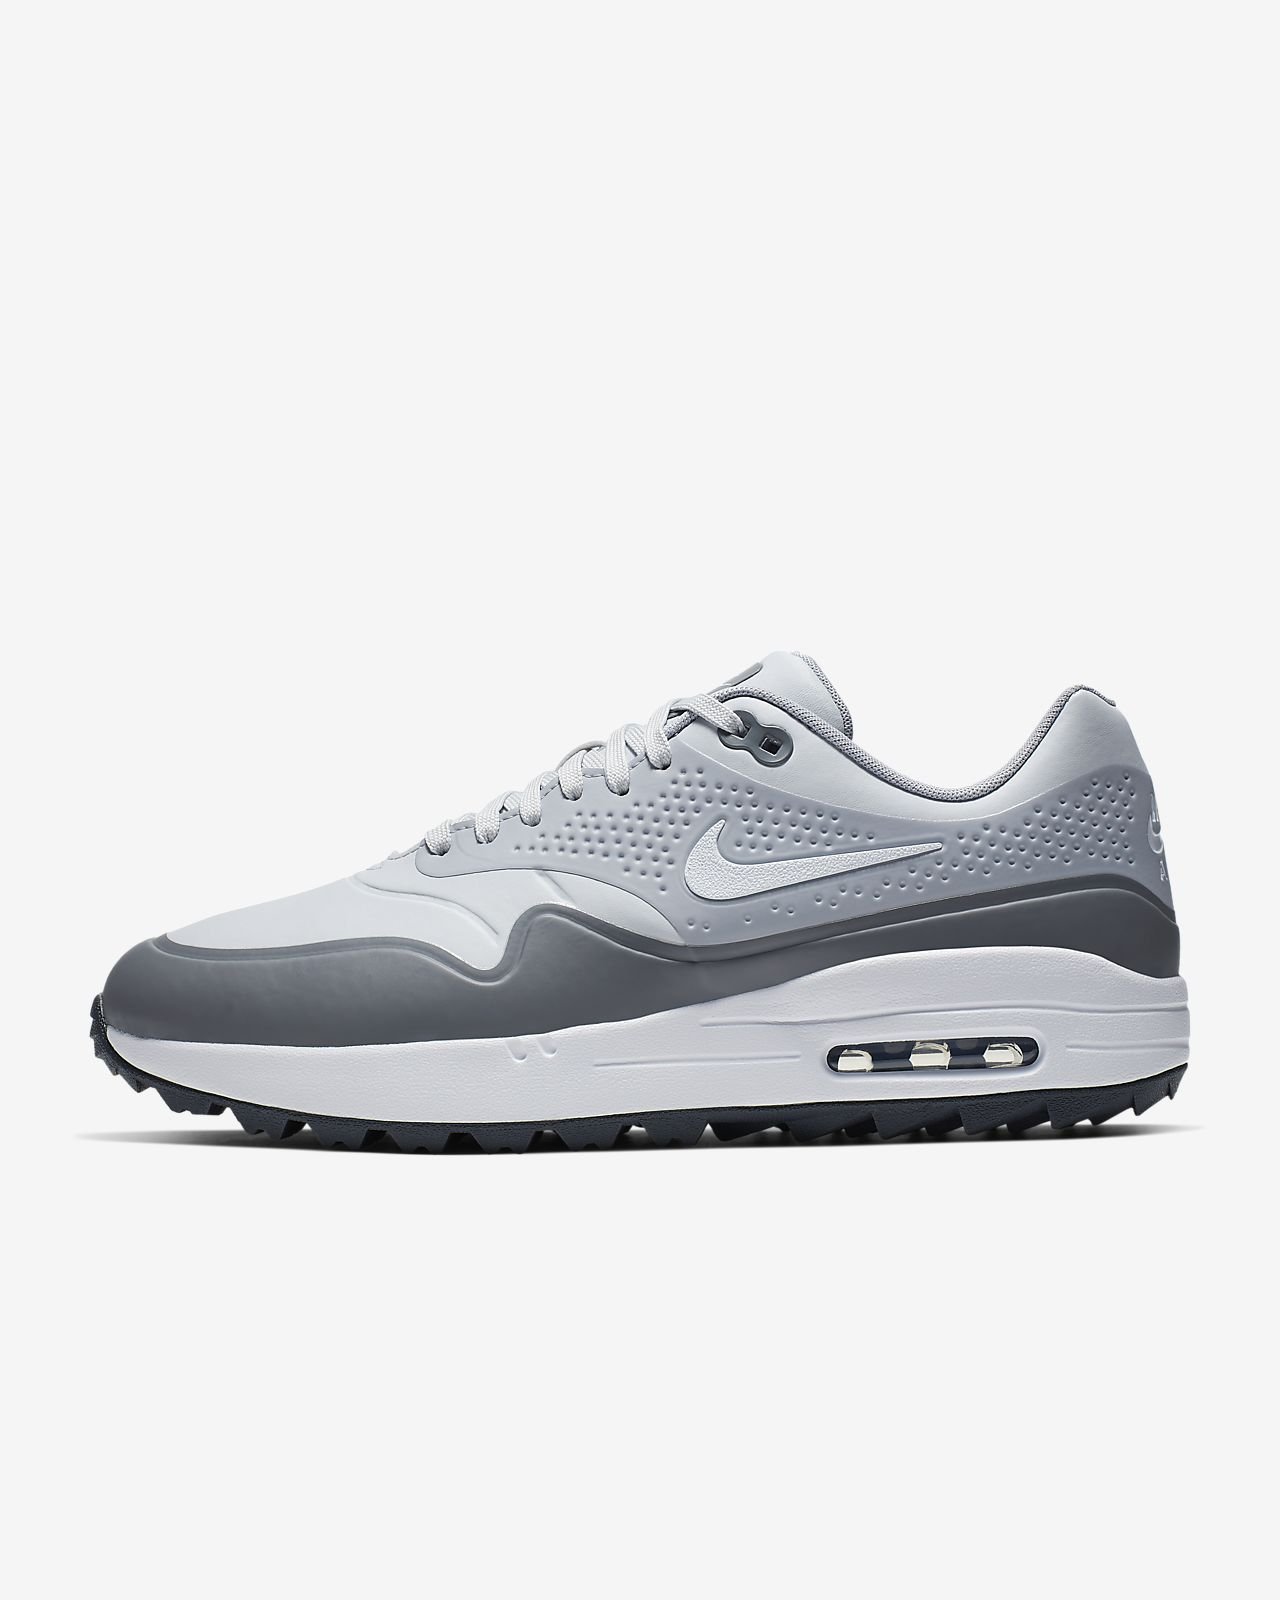 sports shoes a1f67 877fa ... Chaussure de golf Nike Air Max 1 G pour Homme